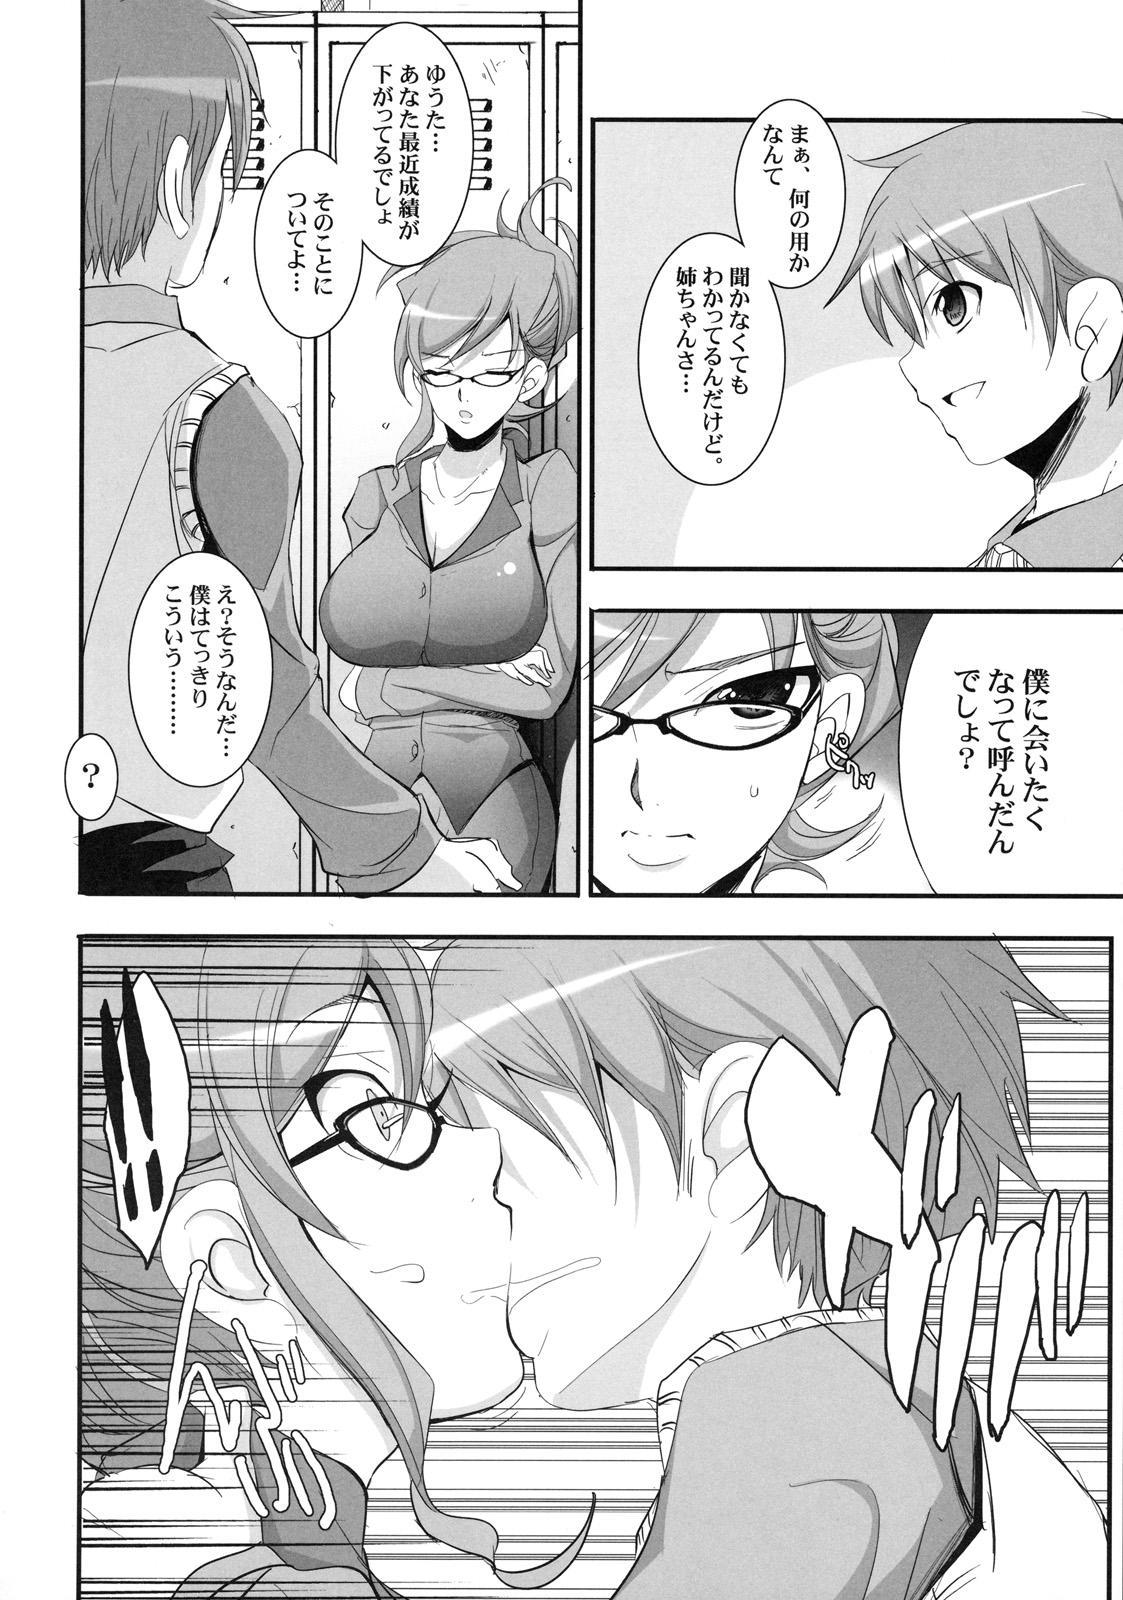 Shinzui Valentine Special Vol. 1 66